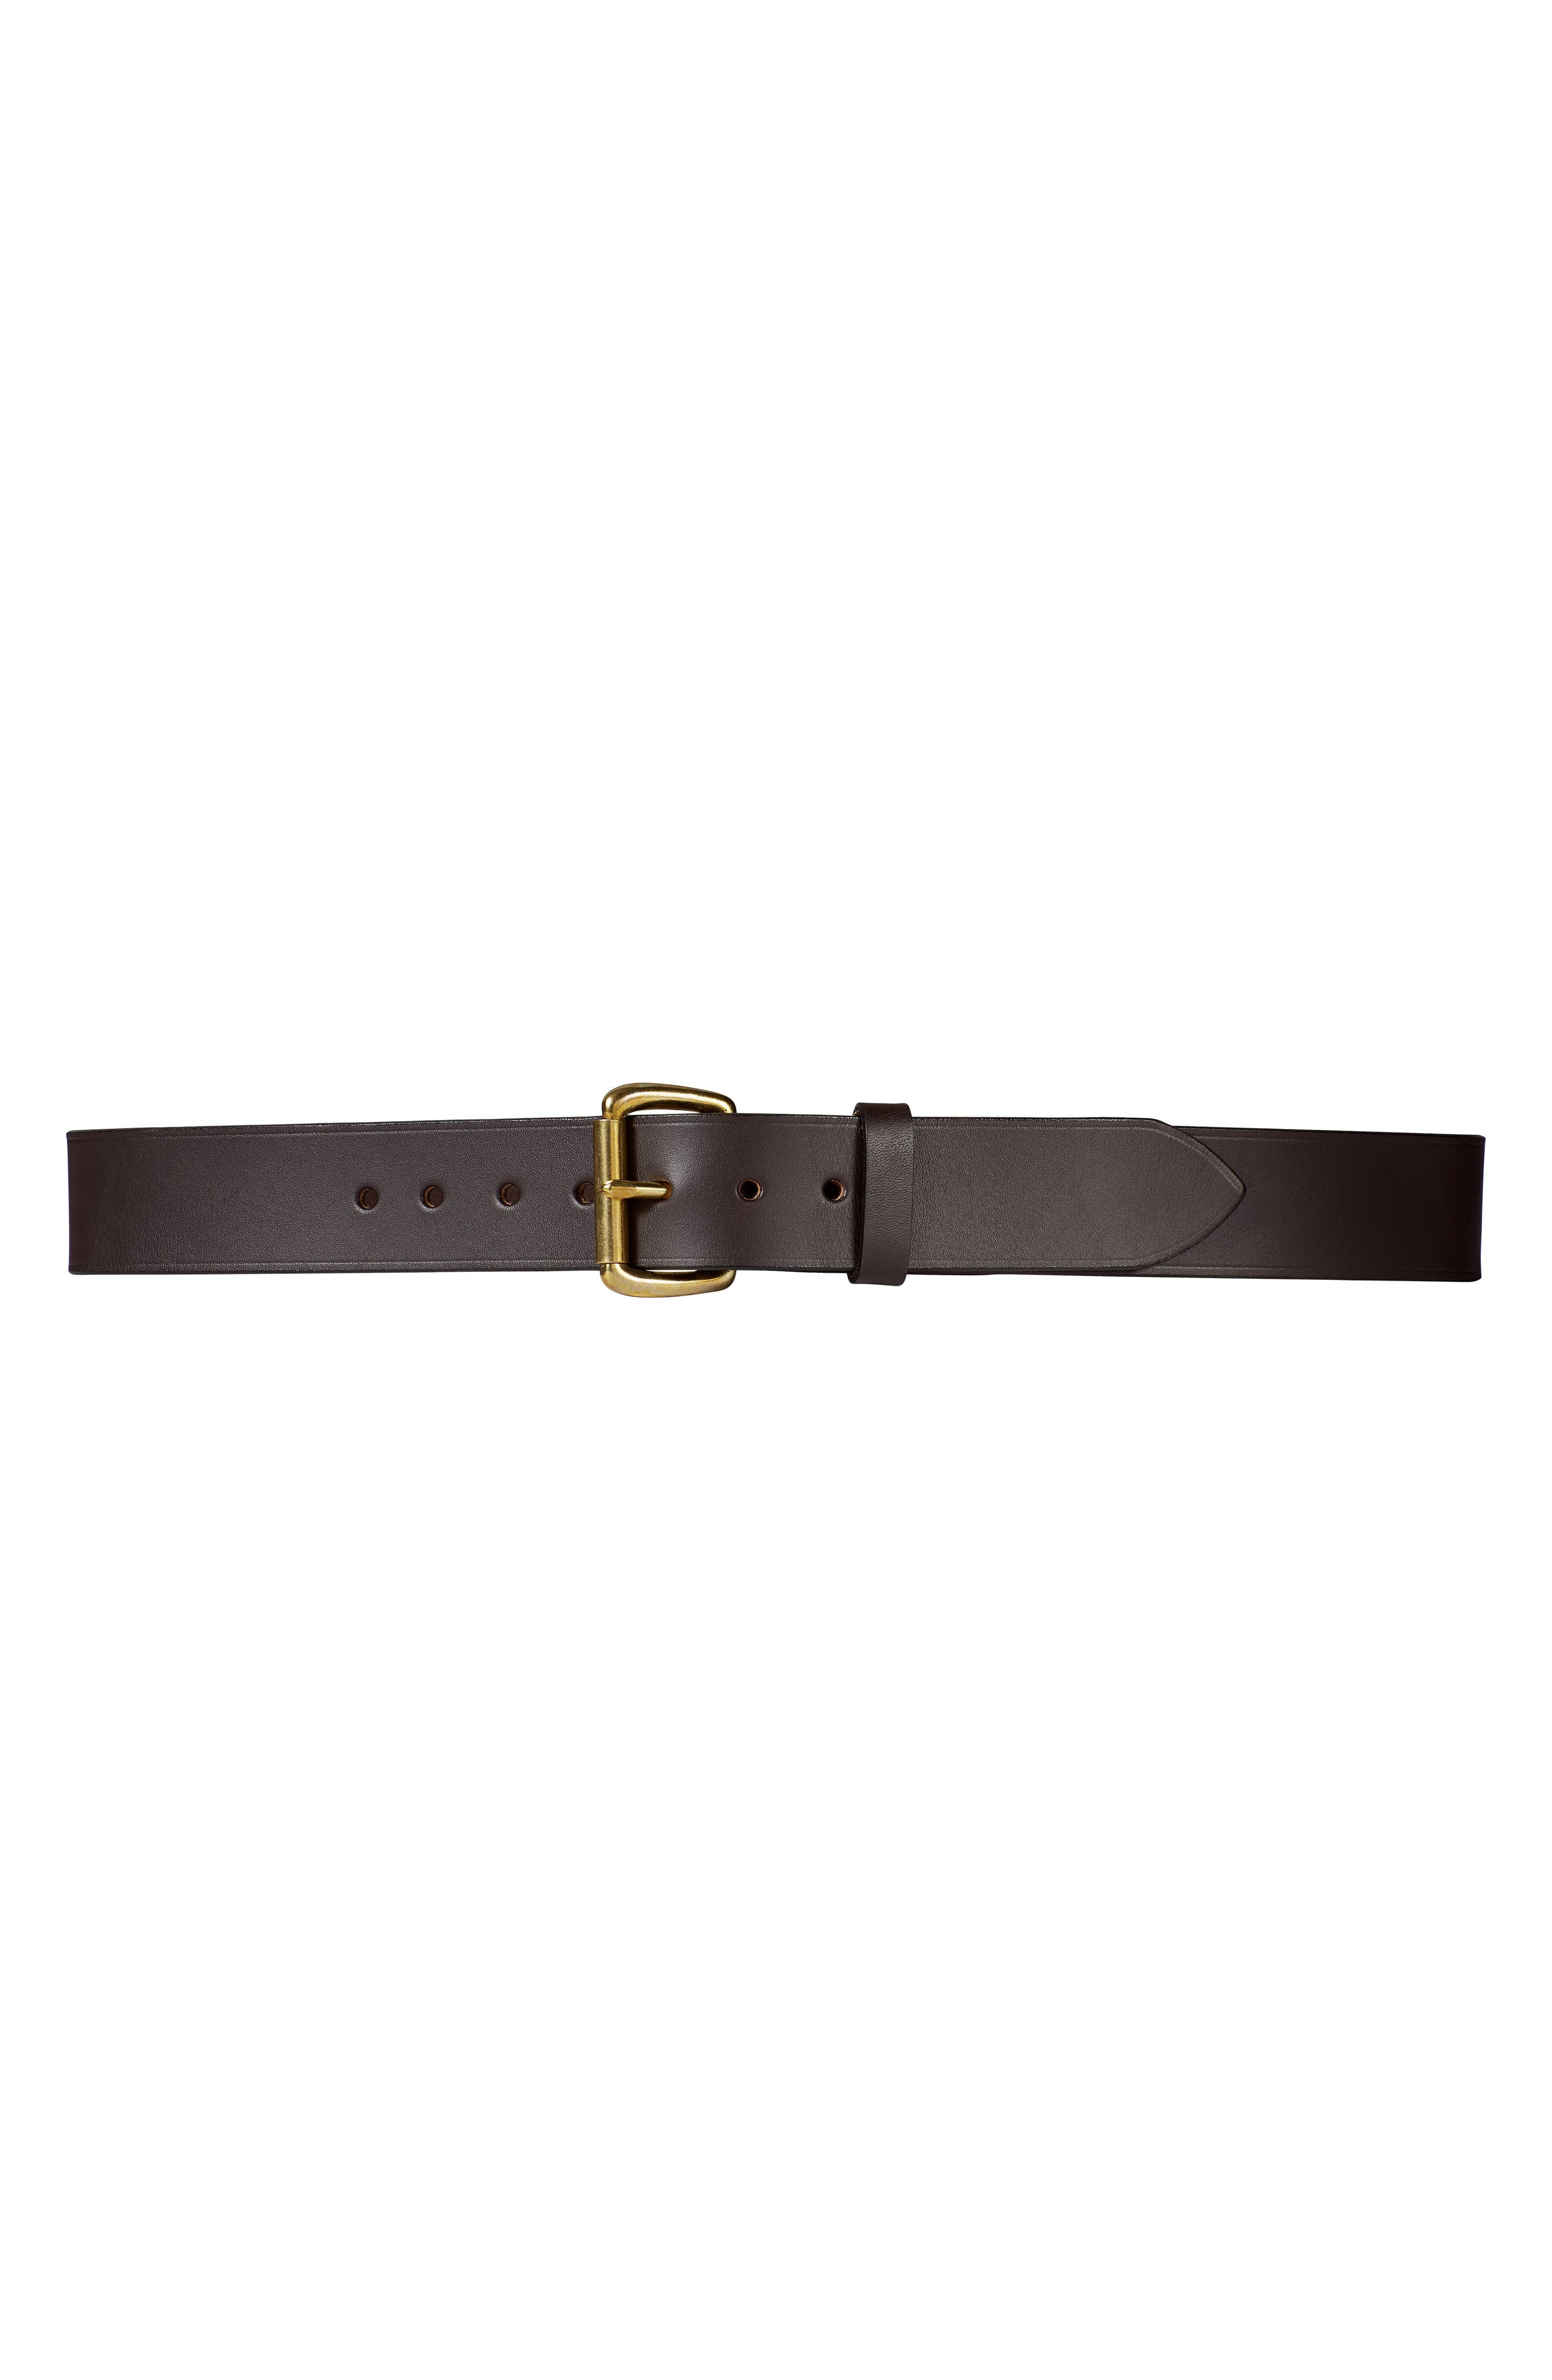 Filson Bridle Leather Belt, Brown/ Brass